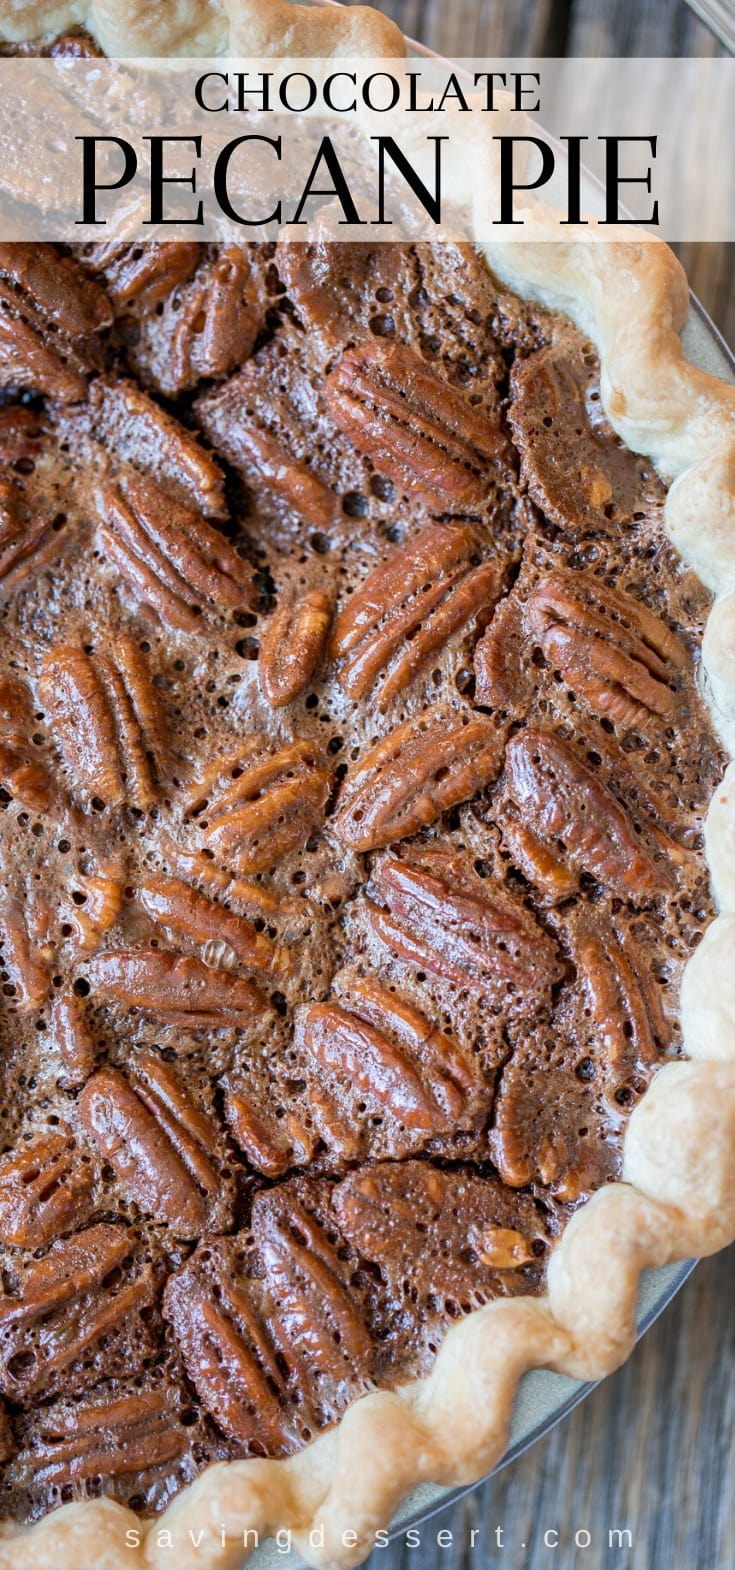 A closeup of a chocolate pecan pie